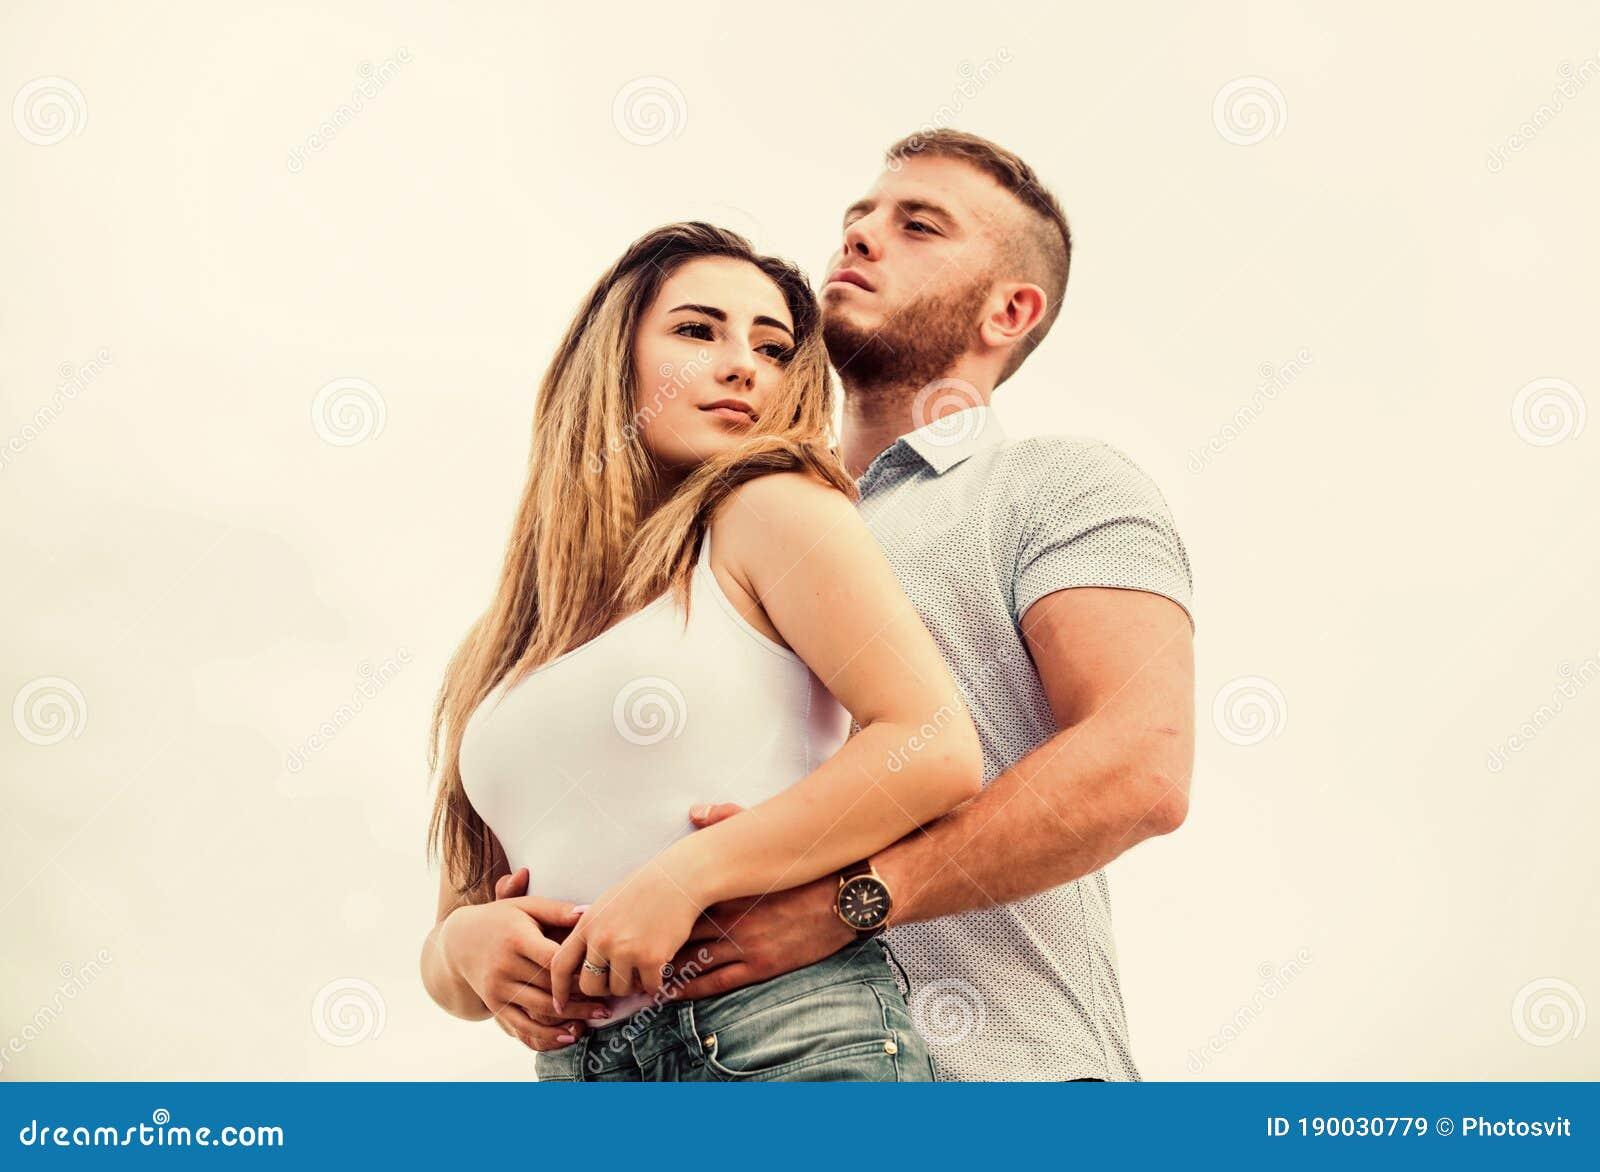 Girls guys sexy kissing Celebrity Girls